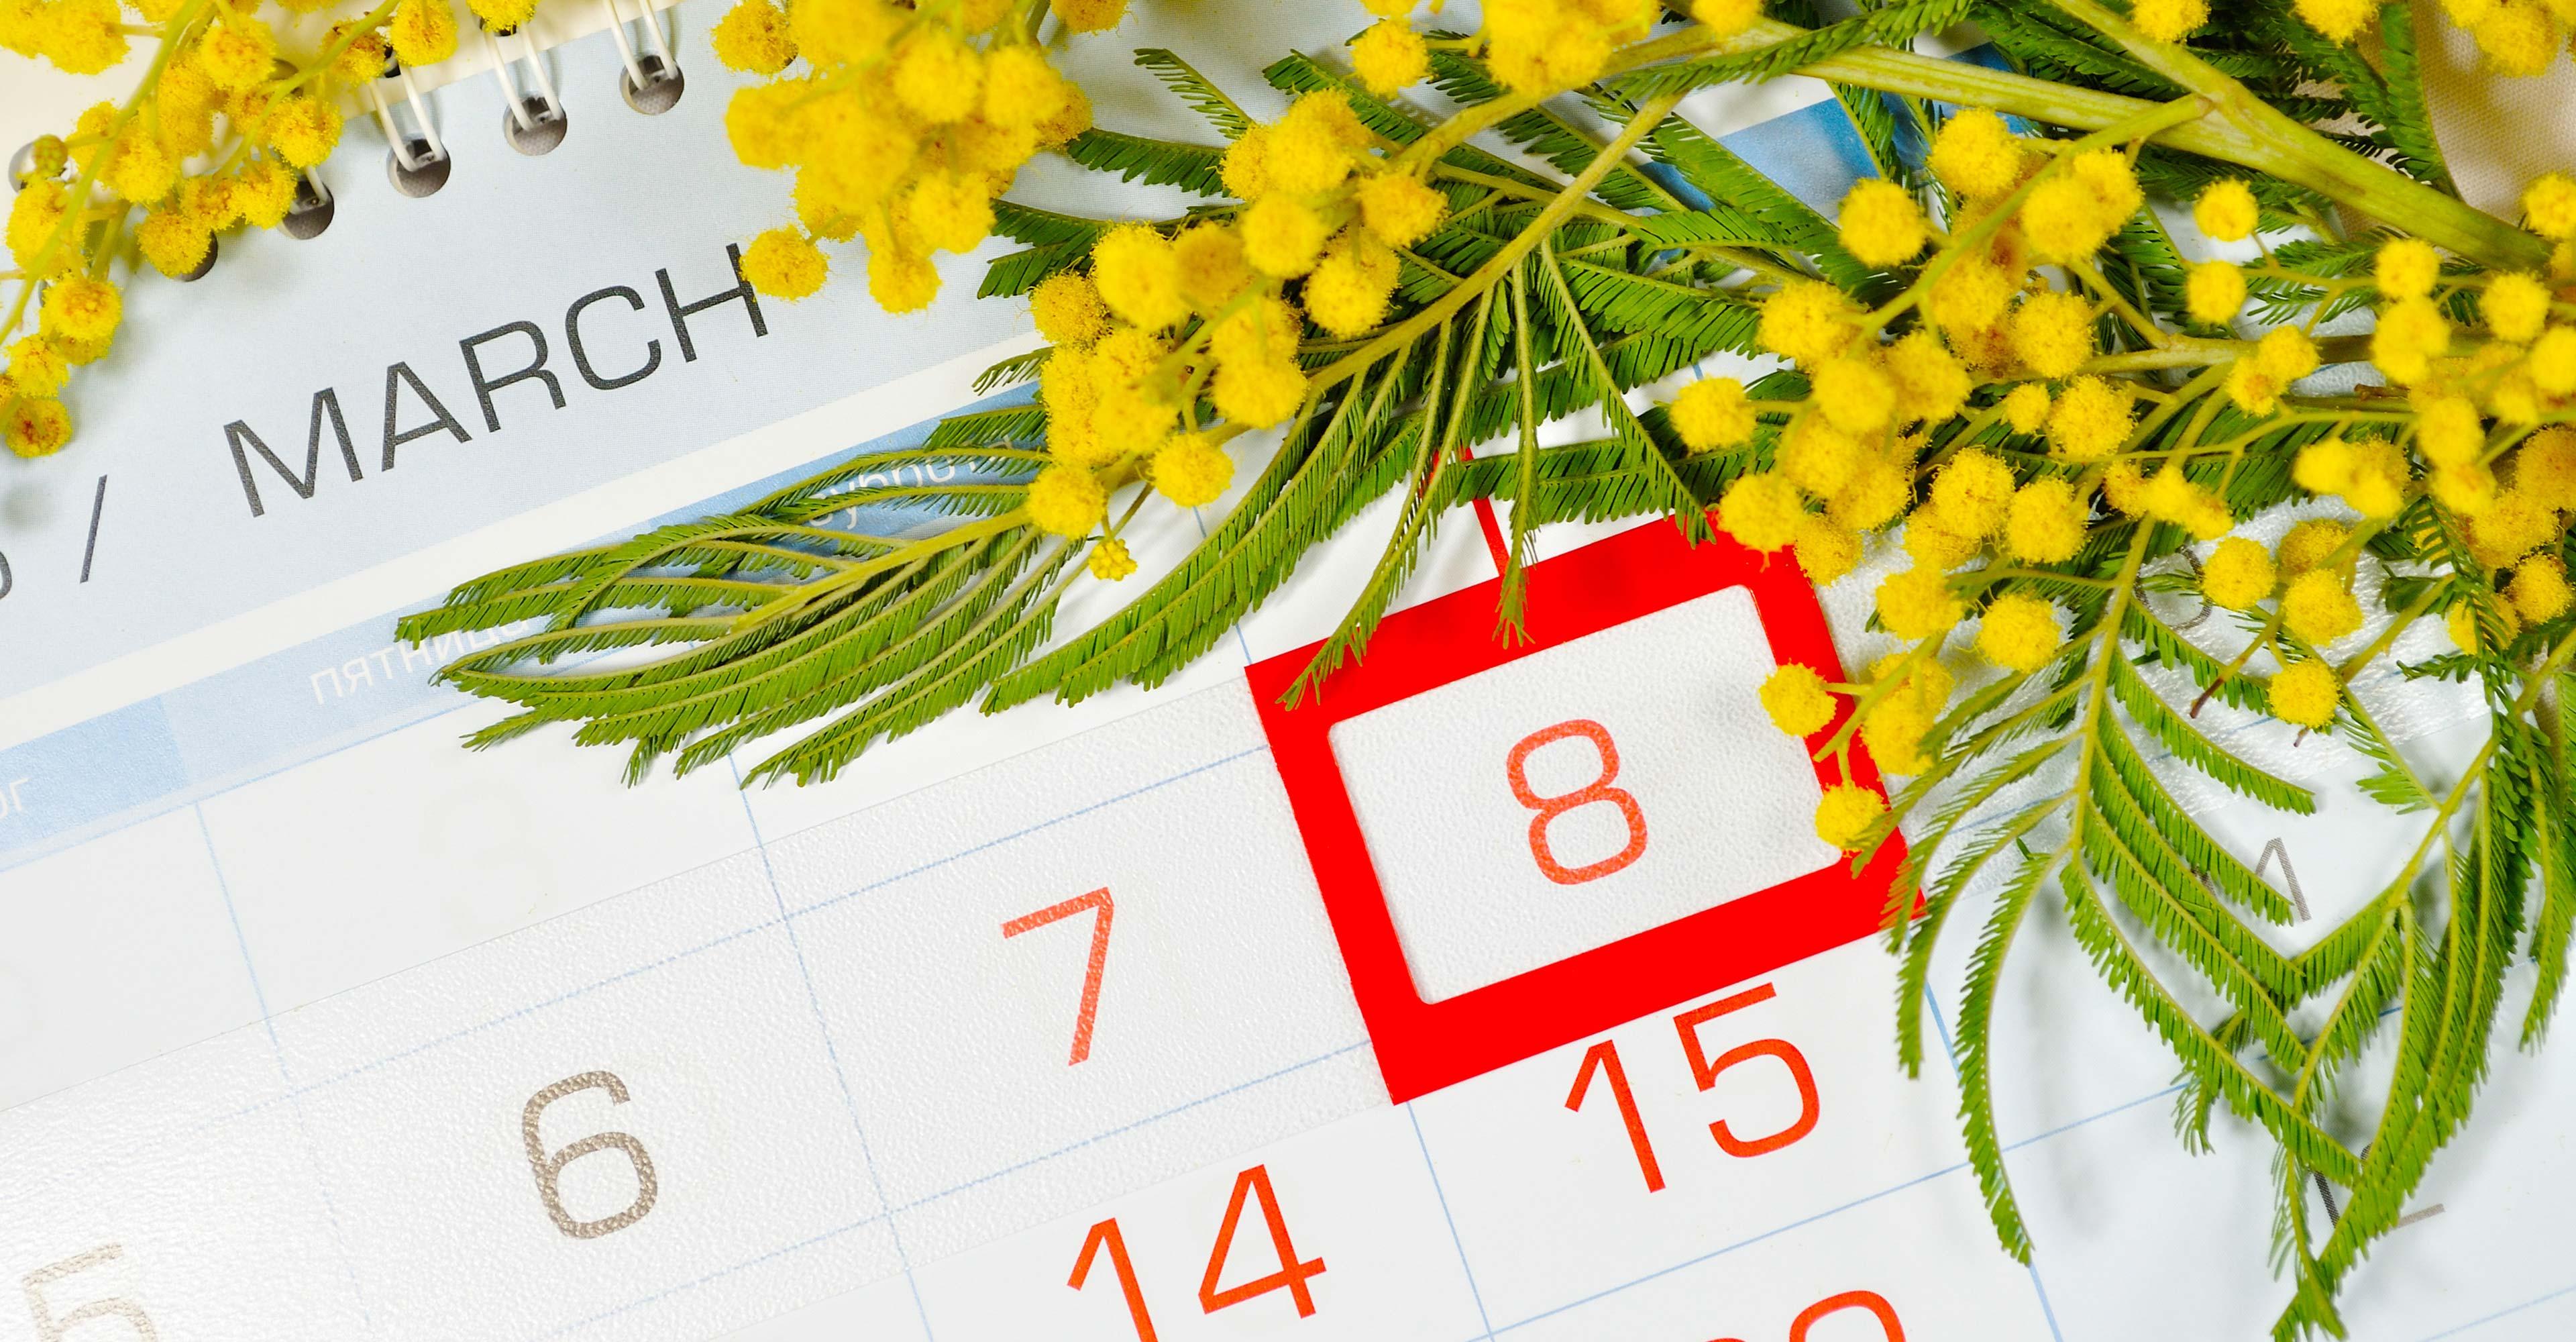 festa donna 8 marzo dolci ingrosso